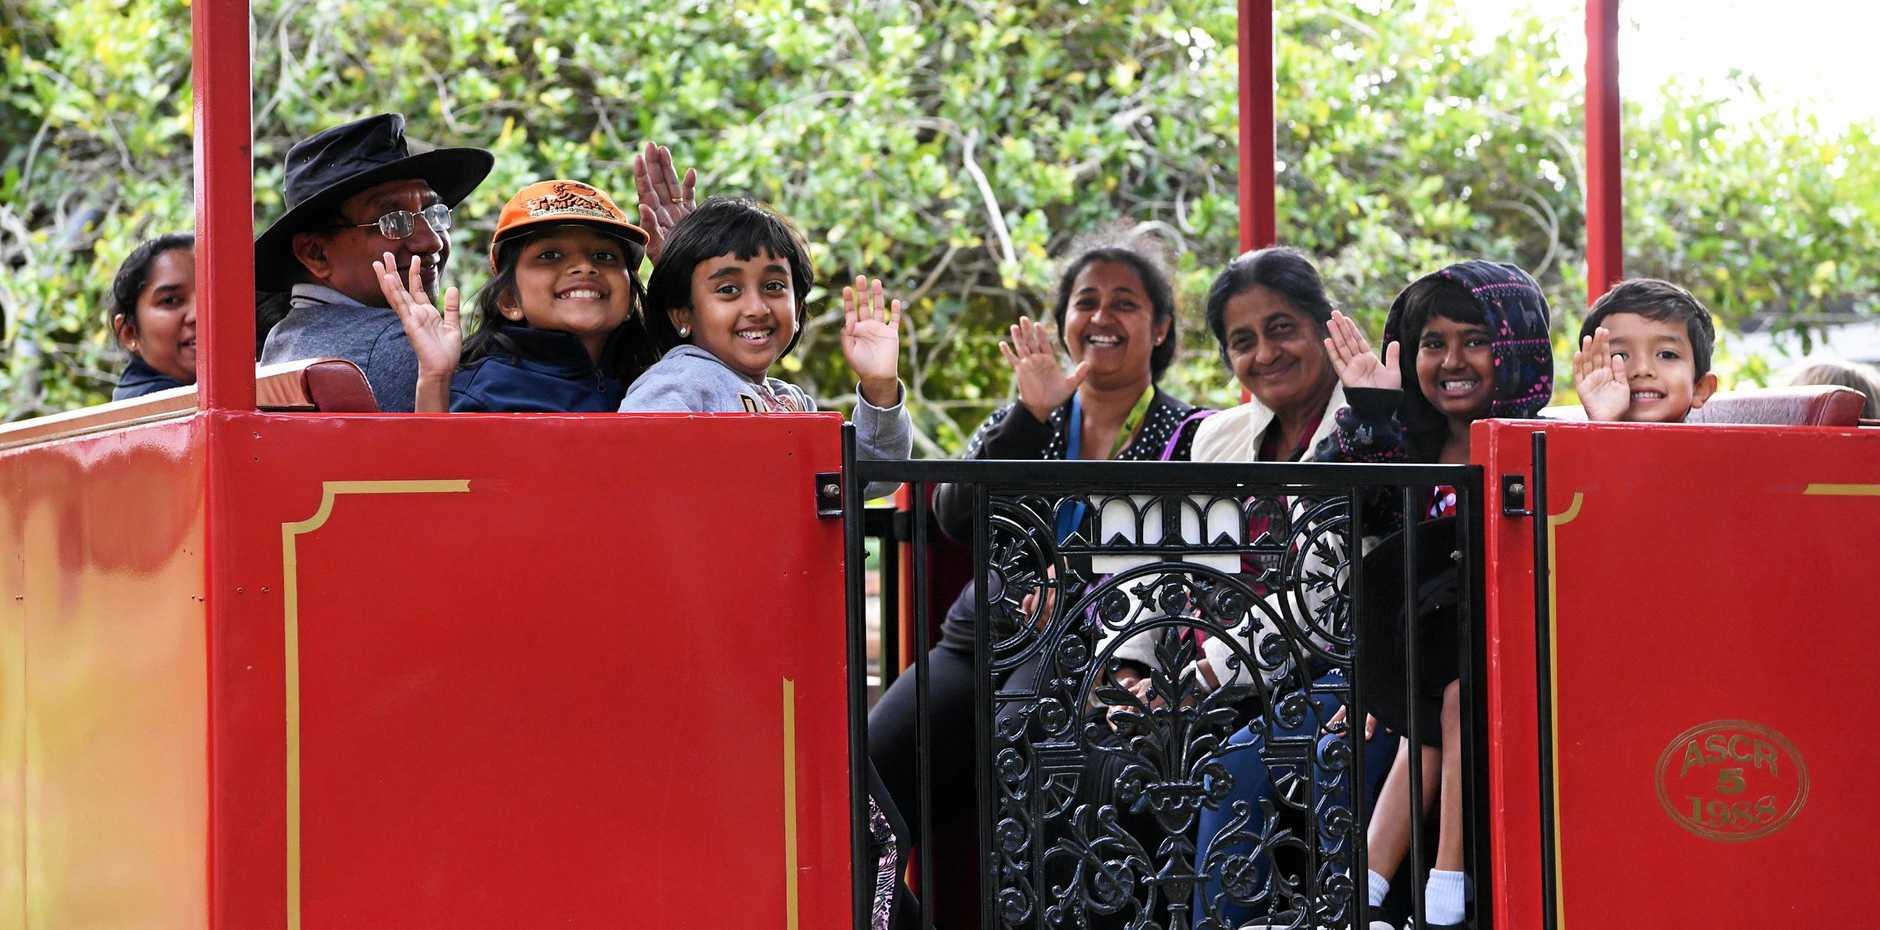 FAMILY HOLIDAY FUN: The Welagedara and De Silva families enjoying their outing on the Australian Sugar Cane Railway in the Bundaberg Botanic Gardens.